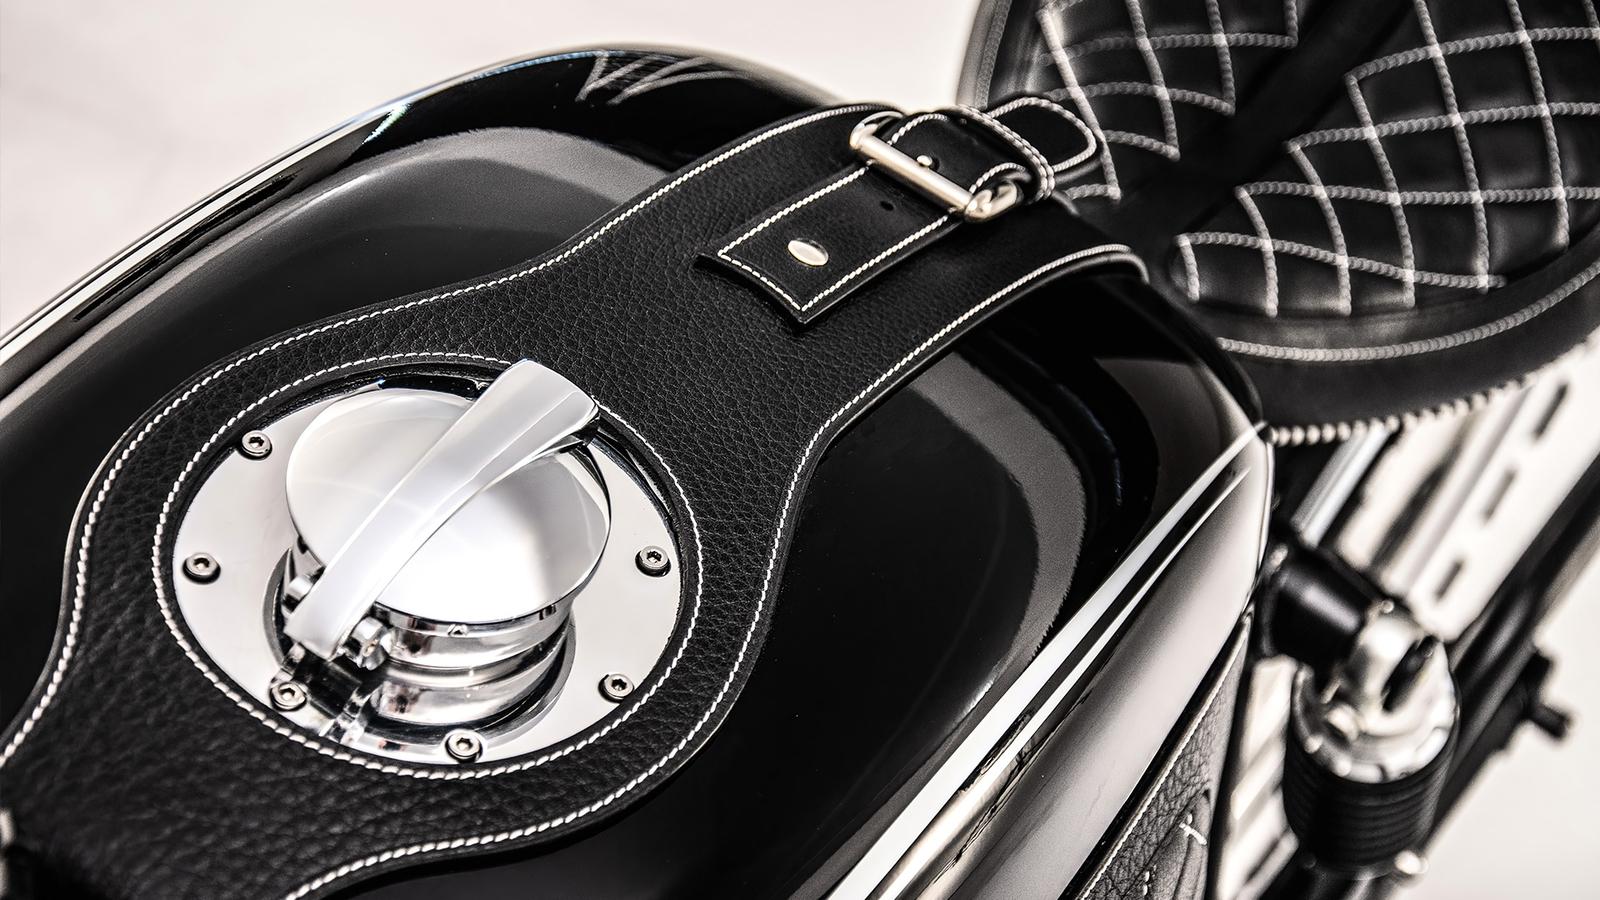 ARES Design BMW R nineT Scrambler